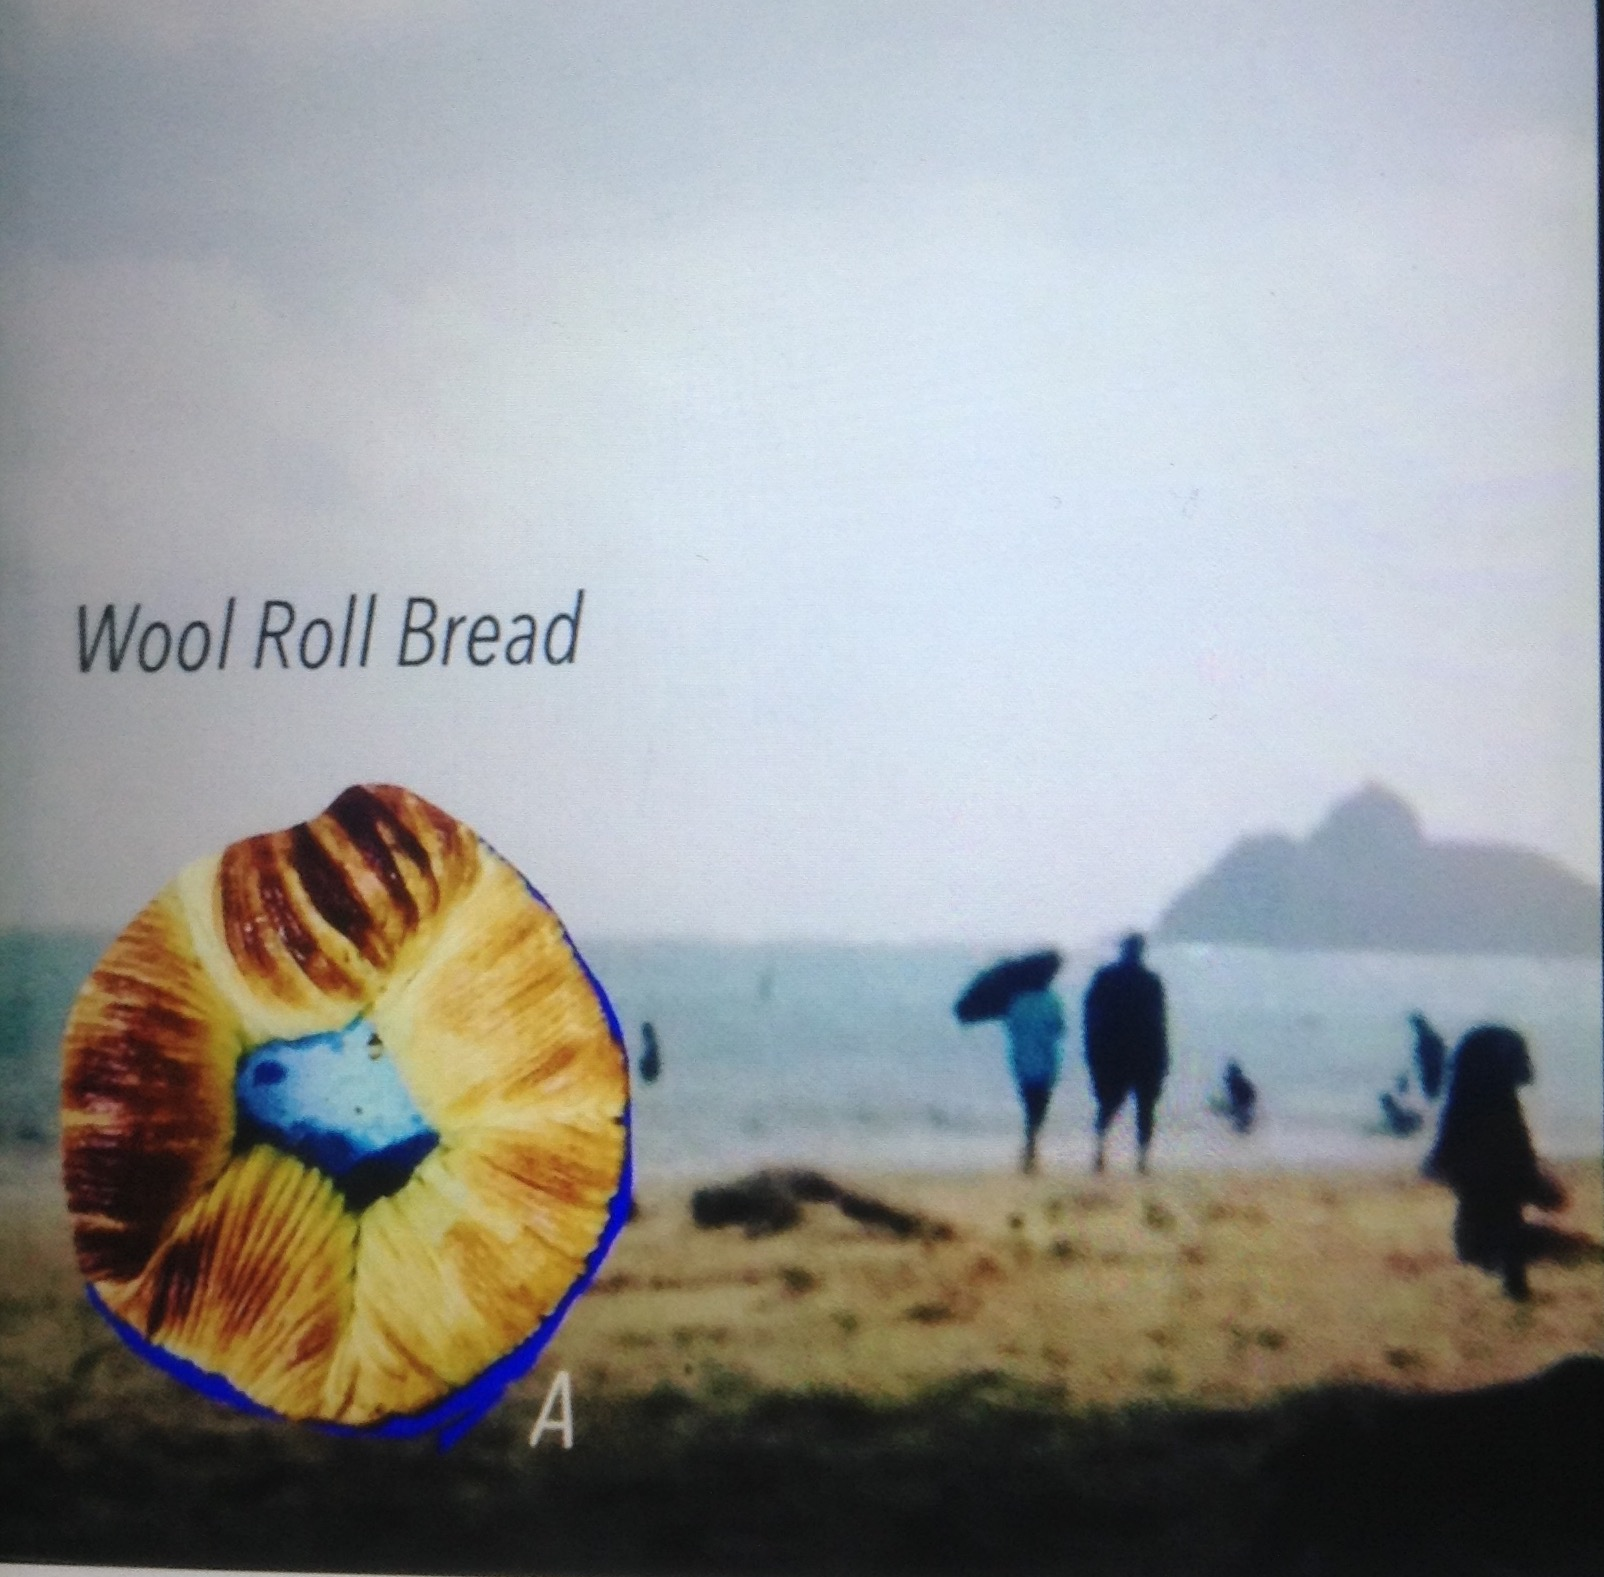 Resep Wool Roll Bread